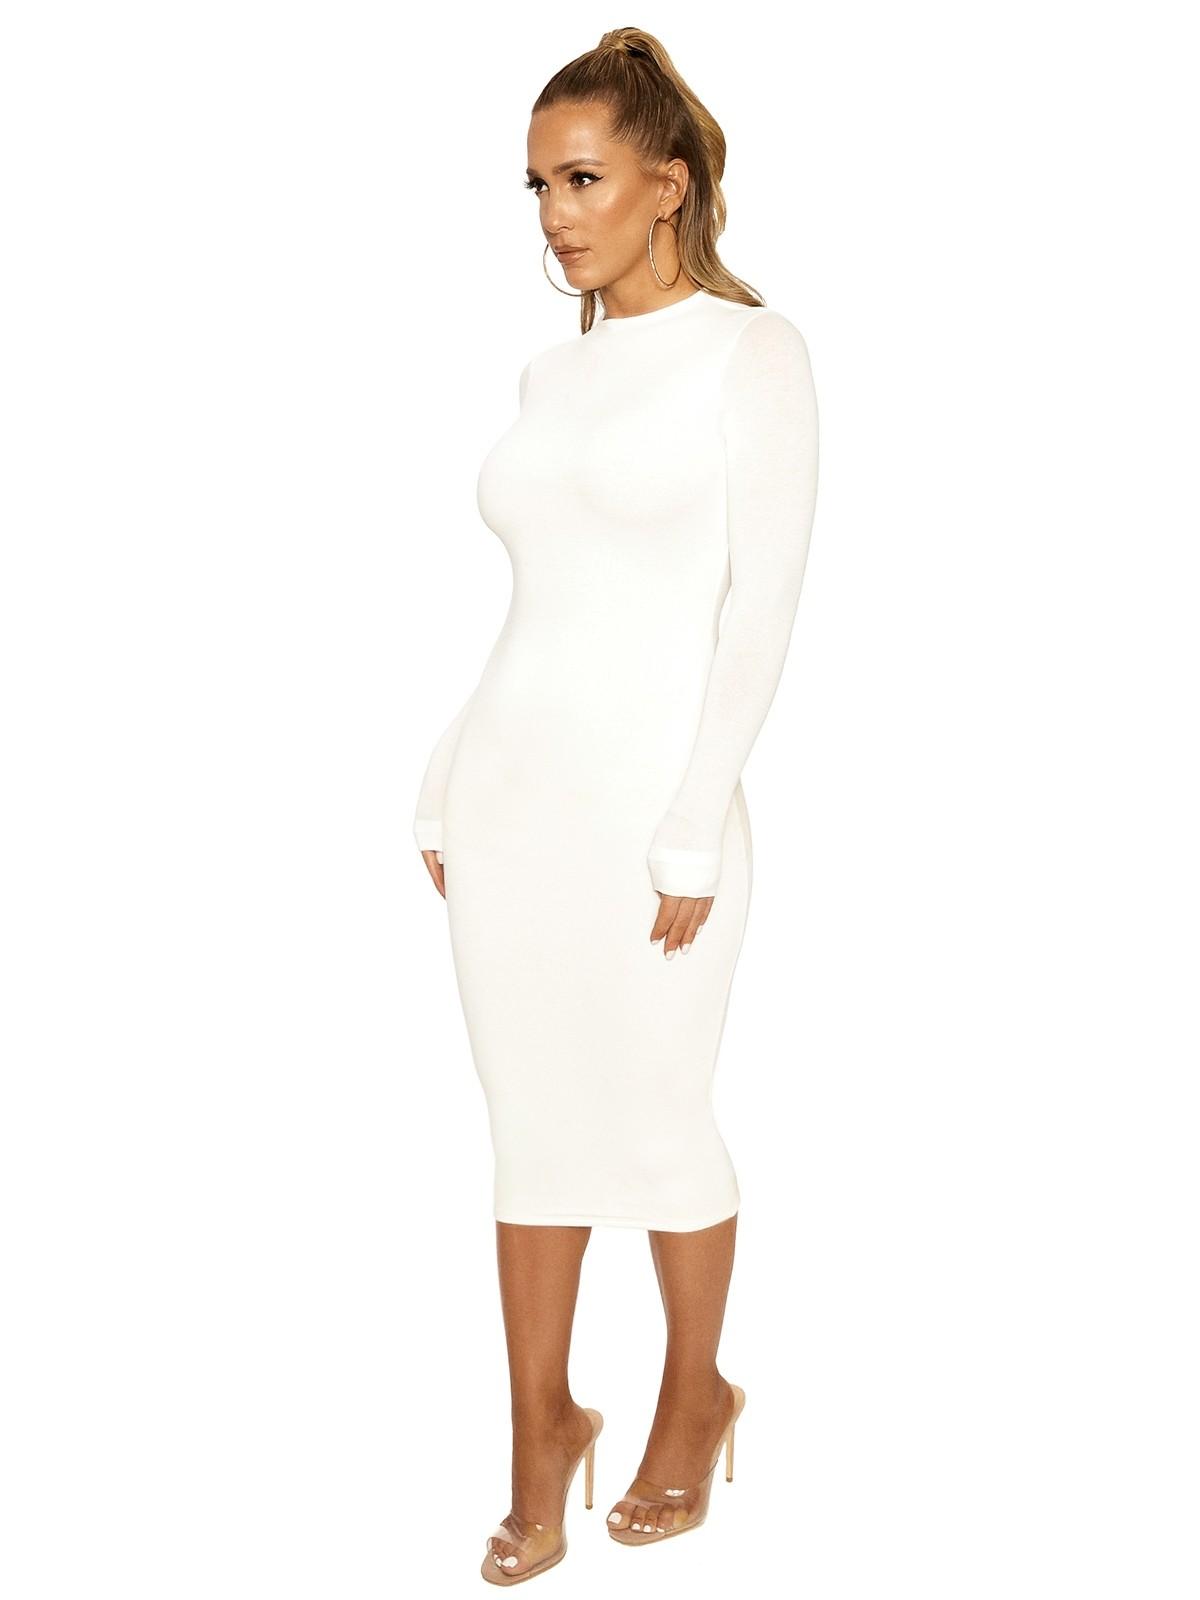 NW Midi Dress by Naked Wardrobe, available on nakedwardrobe.com for $54 Kylie Jenner Dress SIMILAR PRODUCT